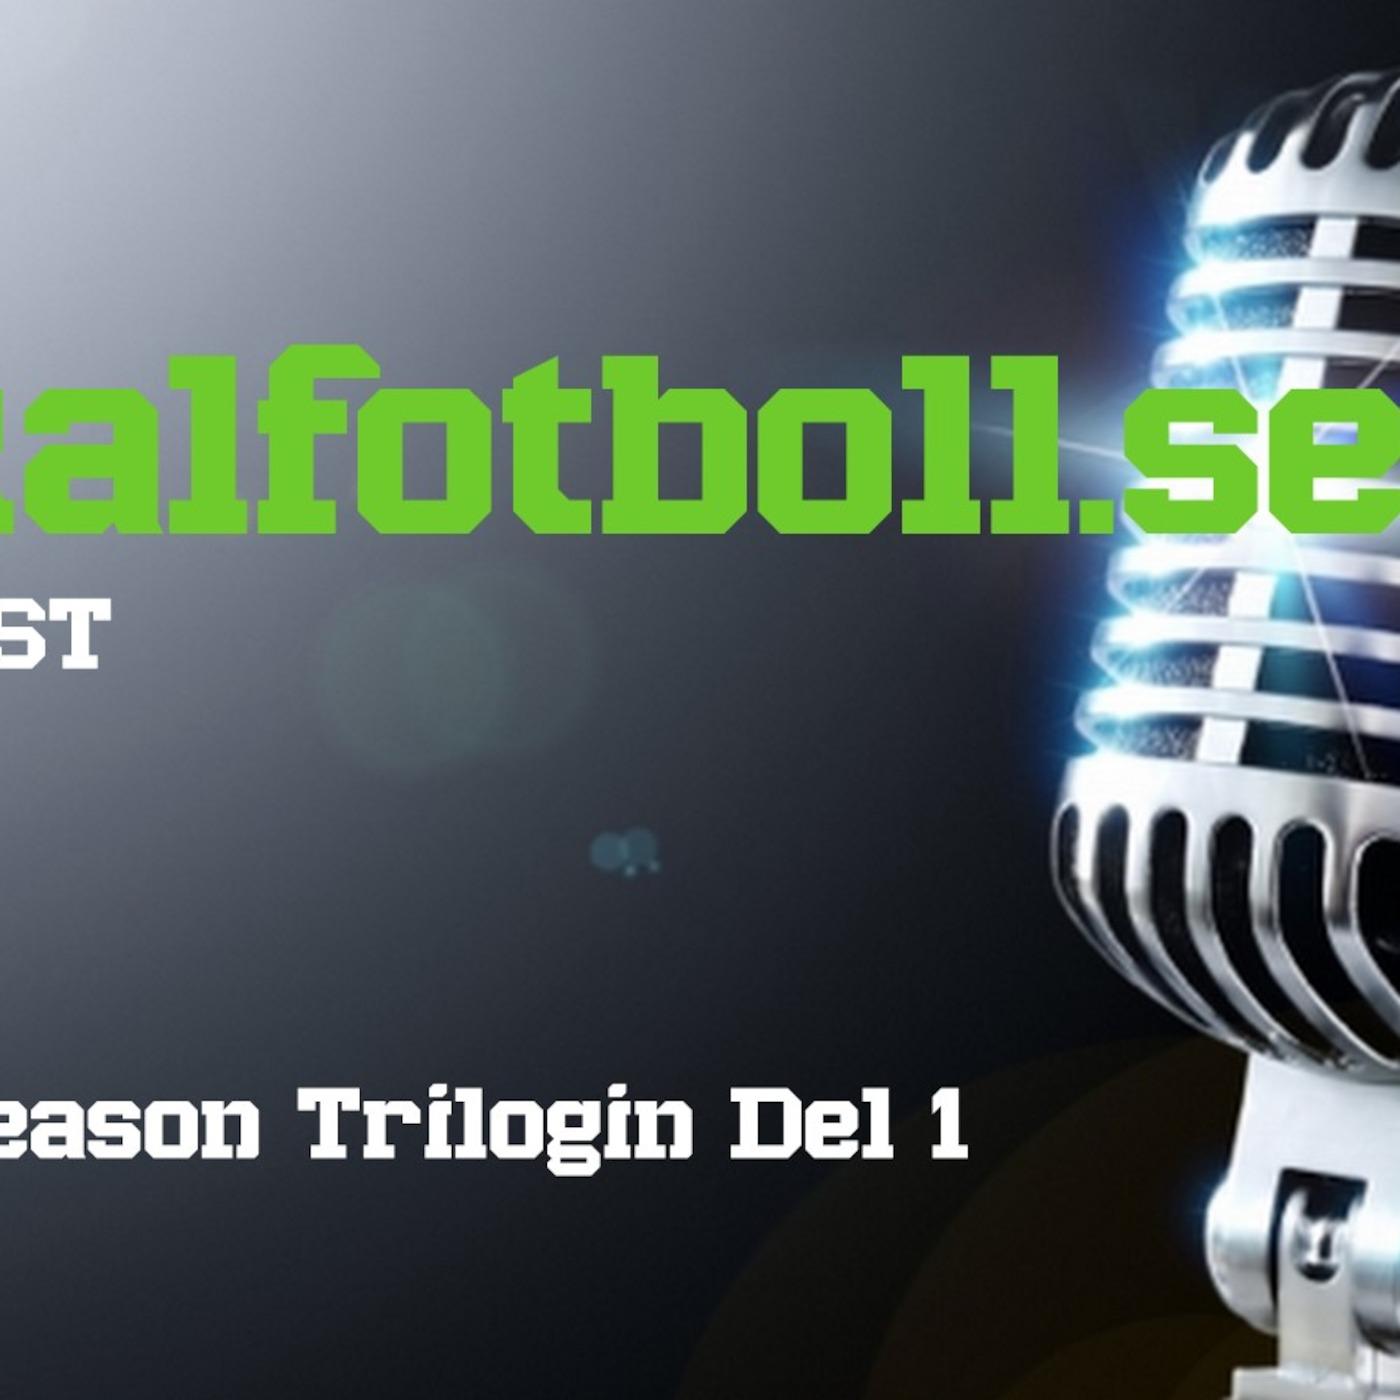 Lokalfotboll.se's Podcast